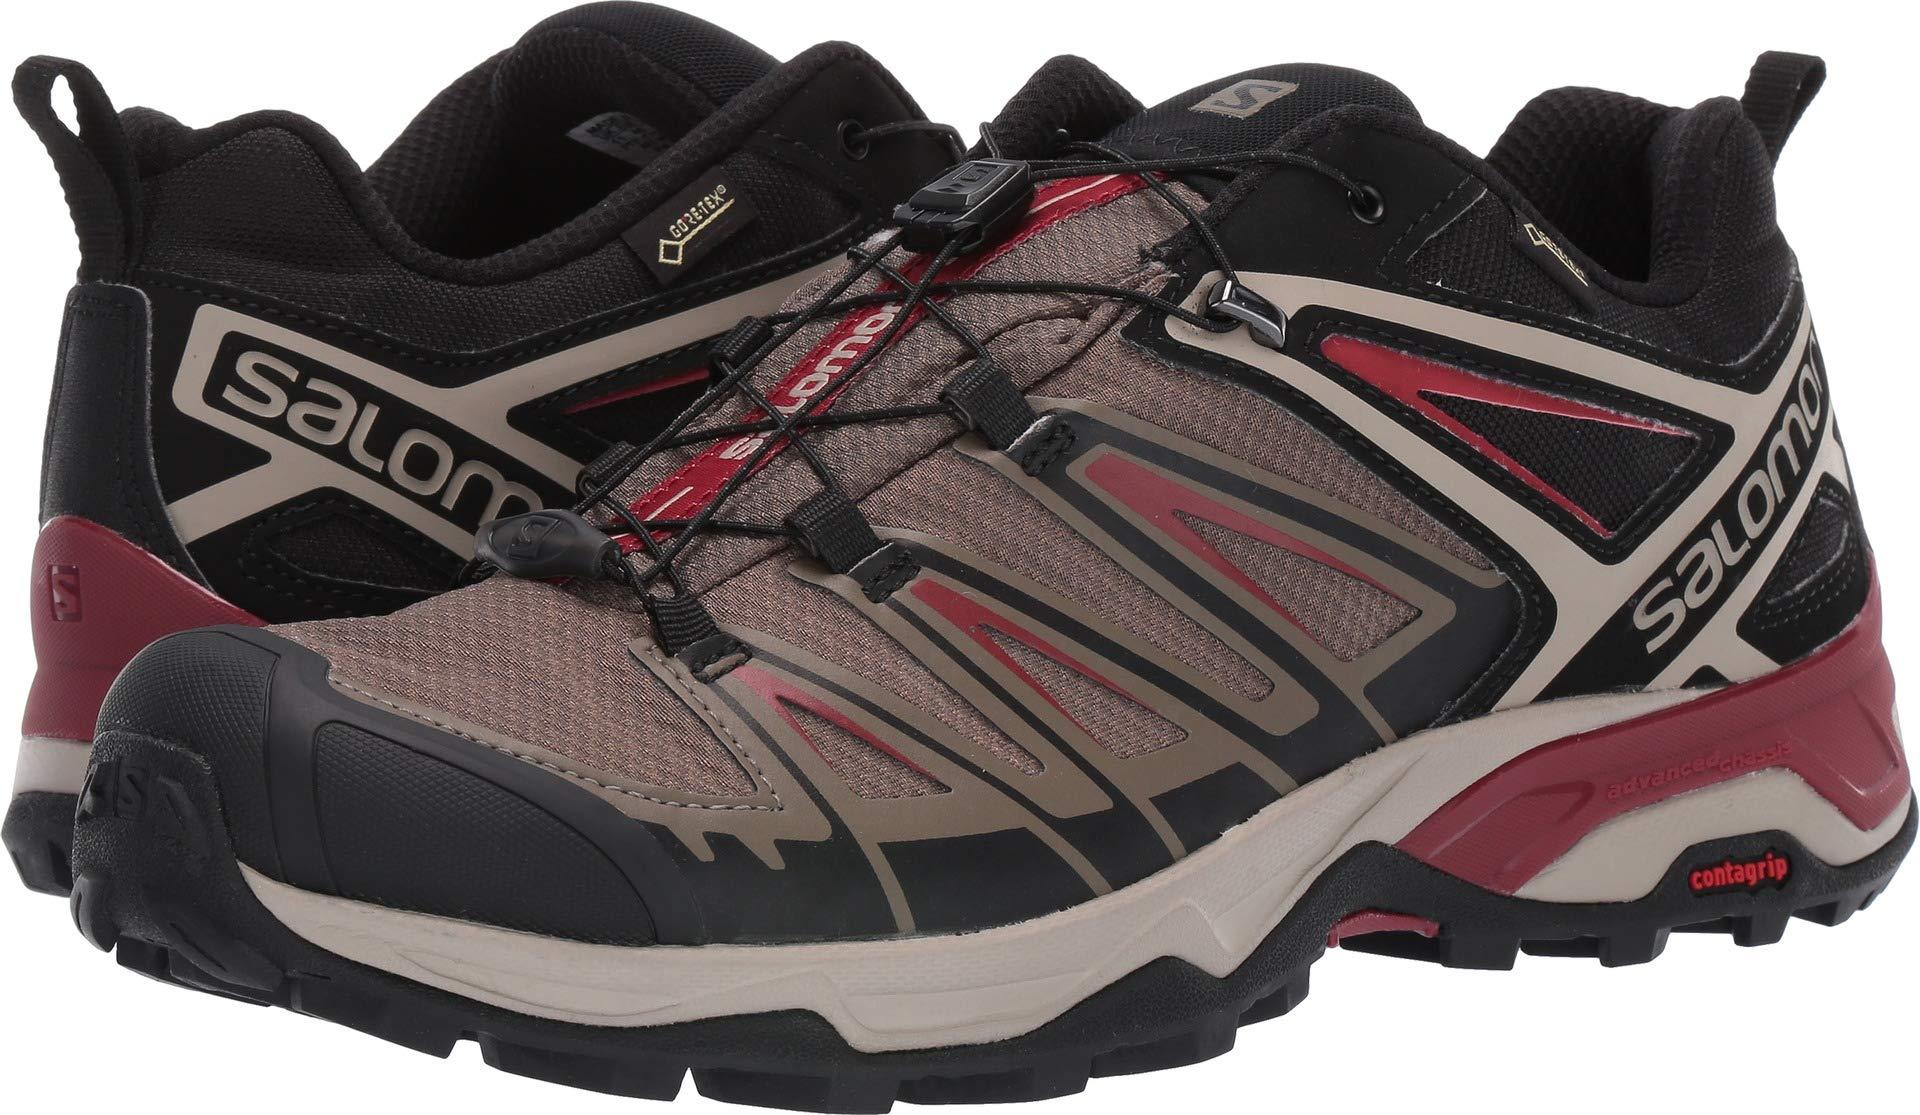 Salomon Men's X Ultra 3 GTX Hiking Shoe, Bungee Cord/Vintage Kaki/Red Dahlia